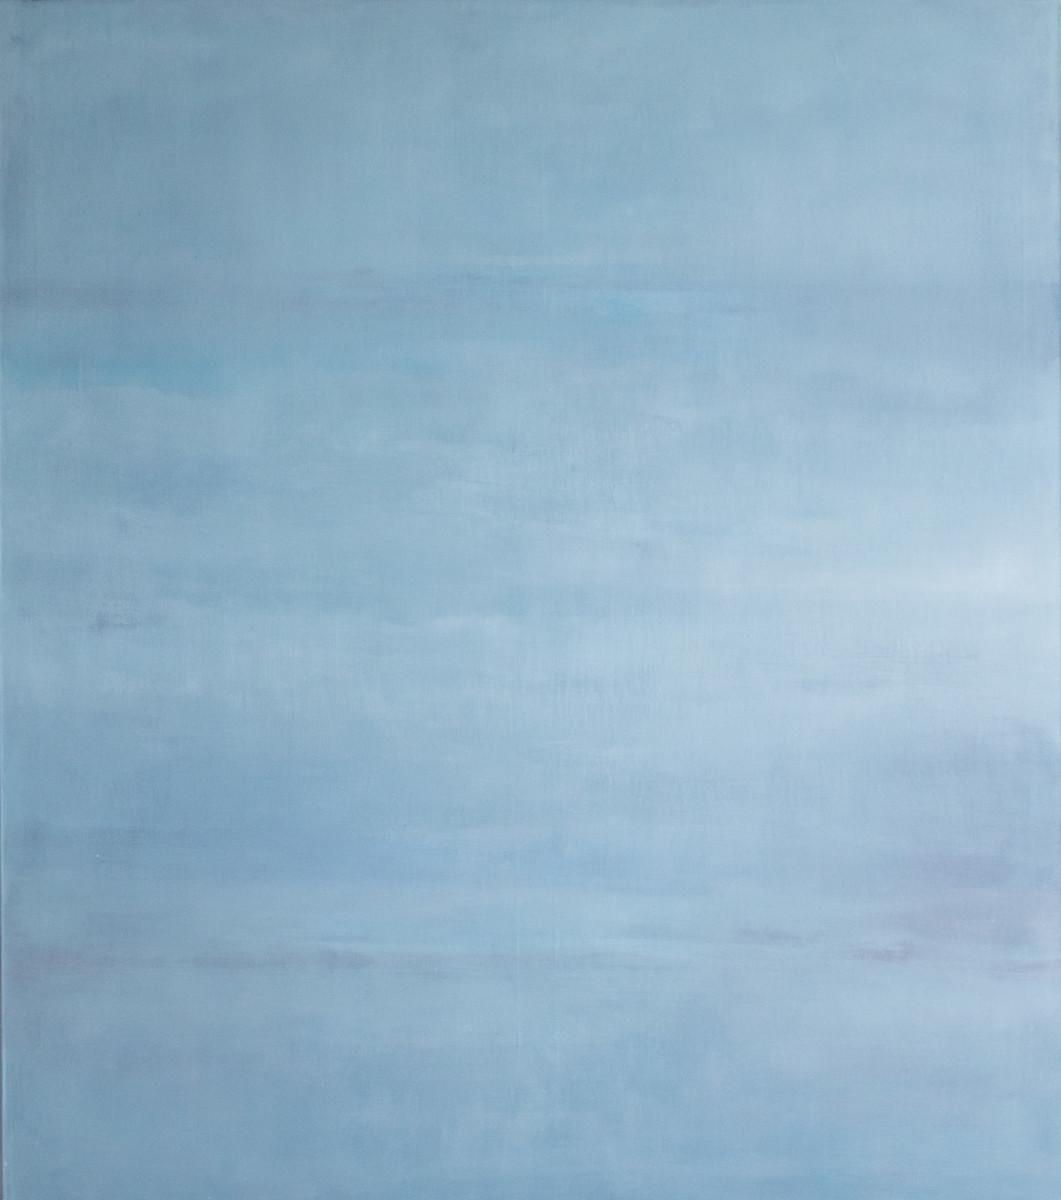 Horizon Series II - (untitled 2)